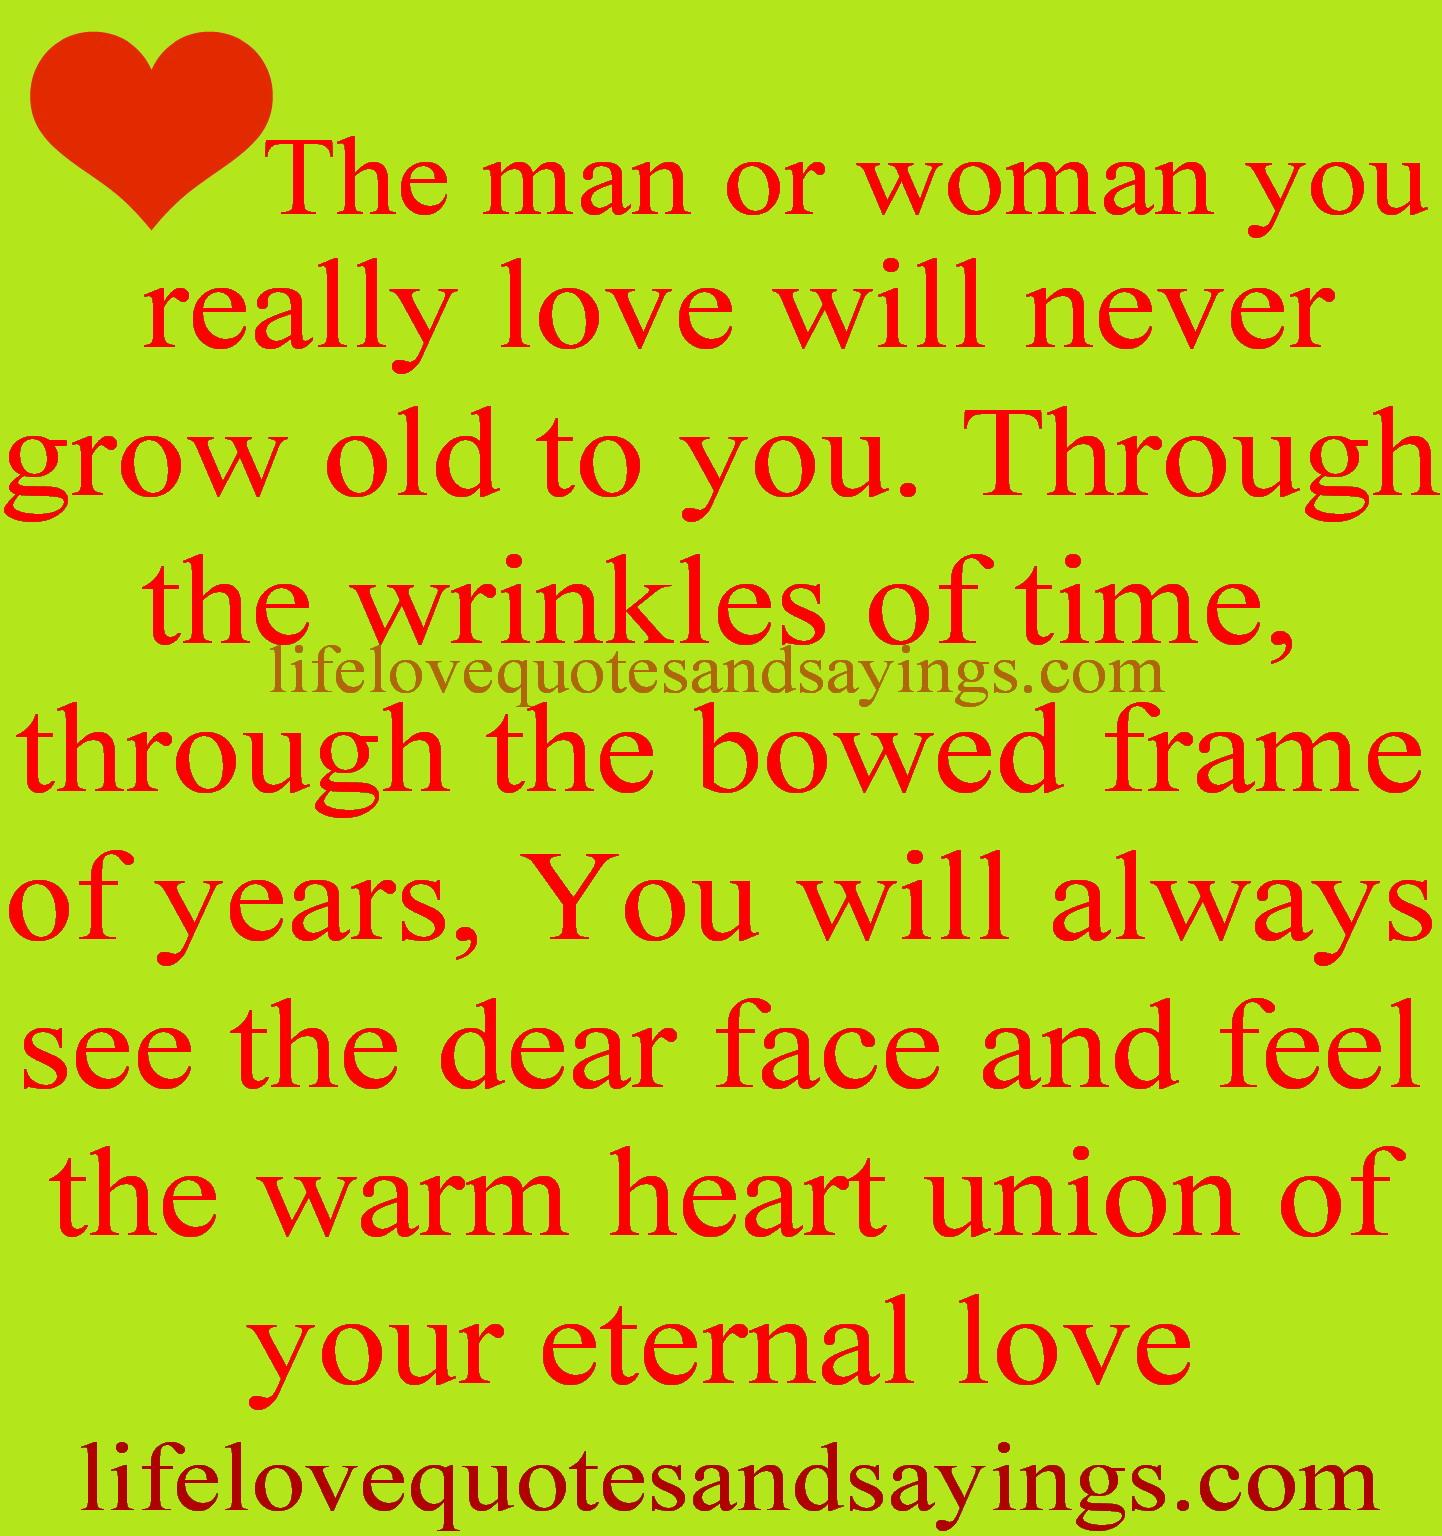 Famous quotes about Eternal Love - QuotationOf . COM